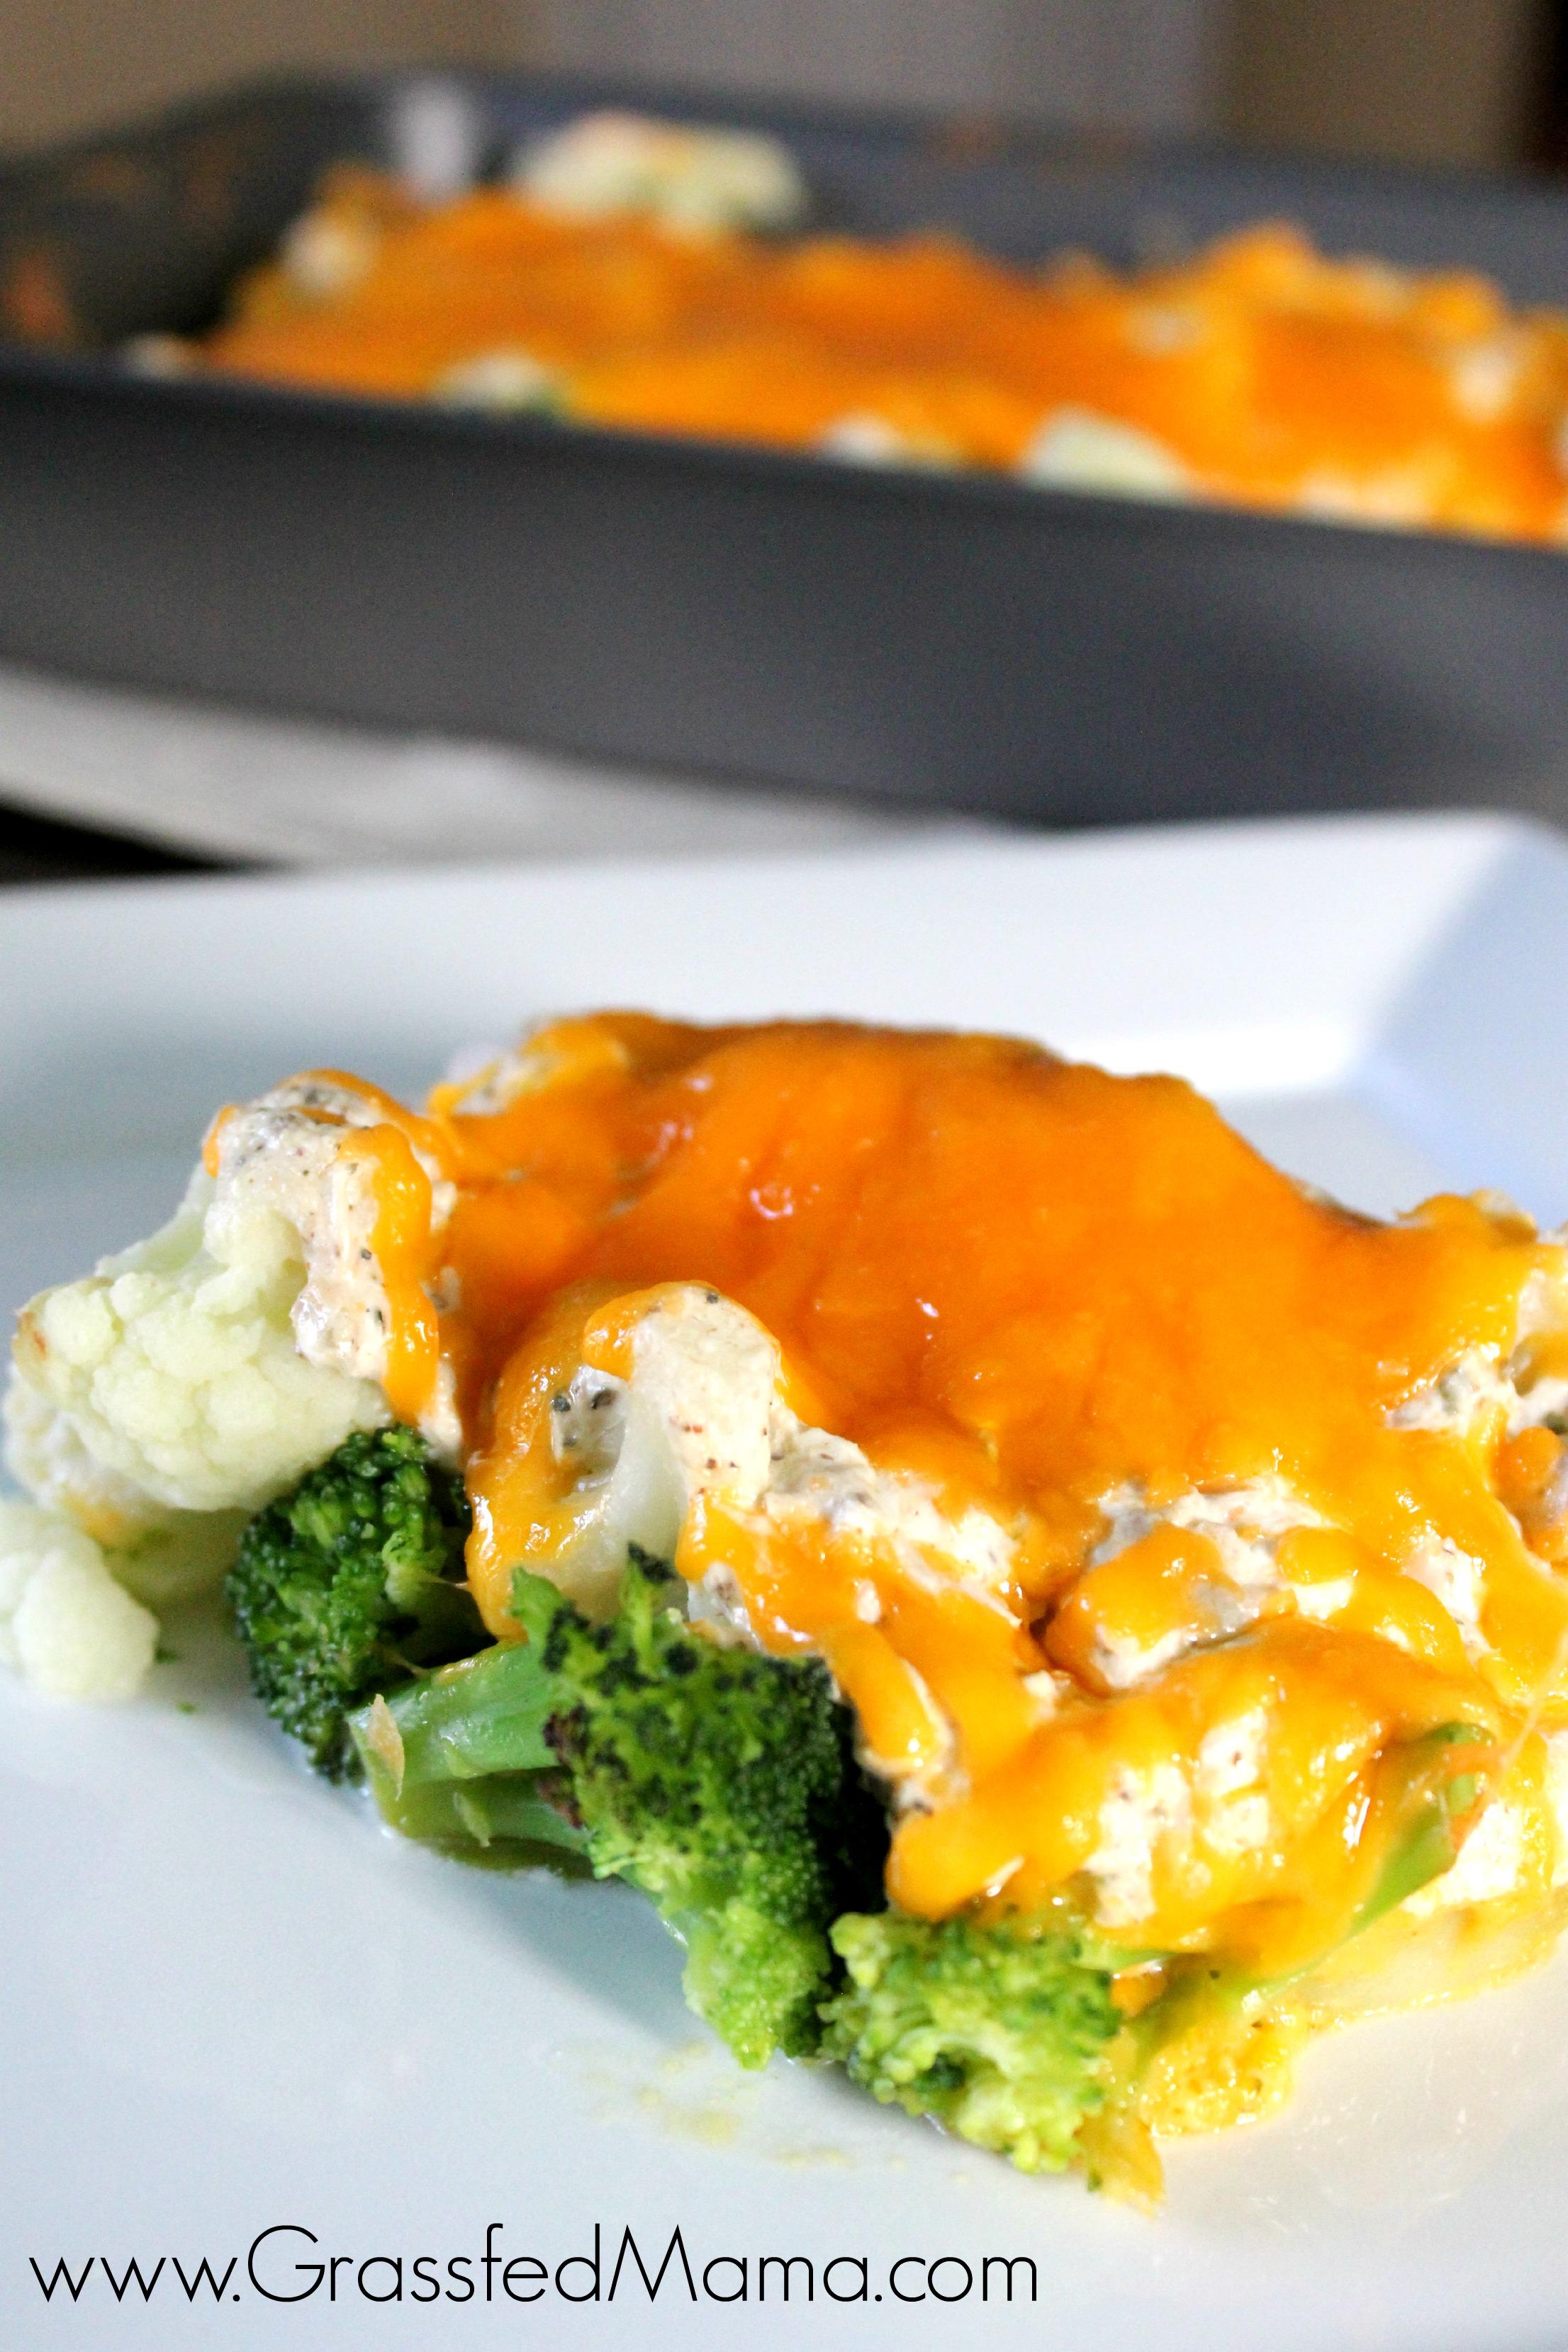 Low Carb Broccoli Tuna Casserole Bake Grassfed Mama